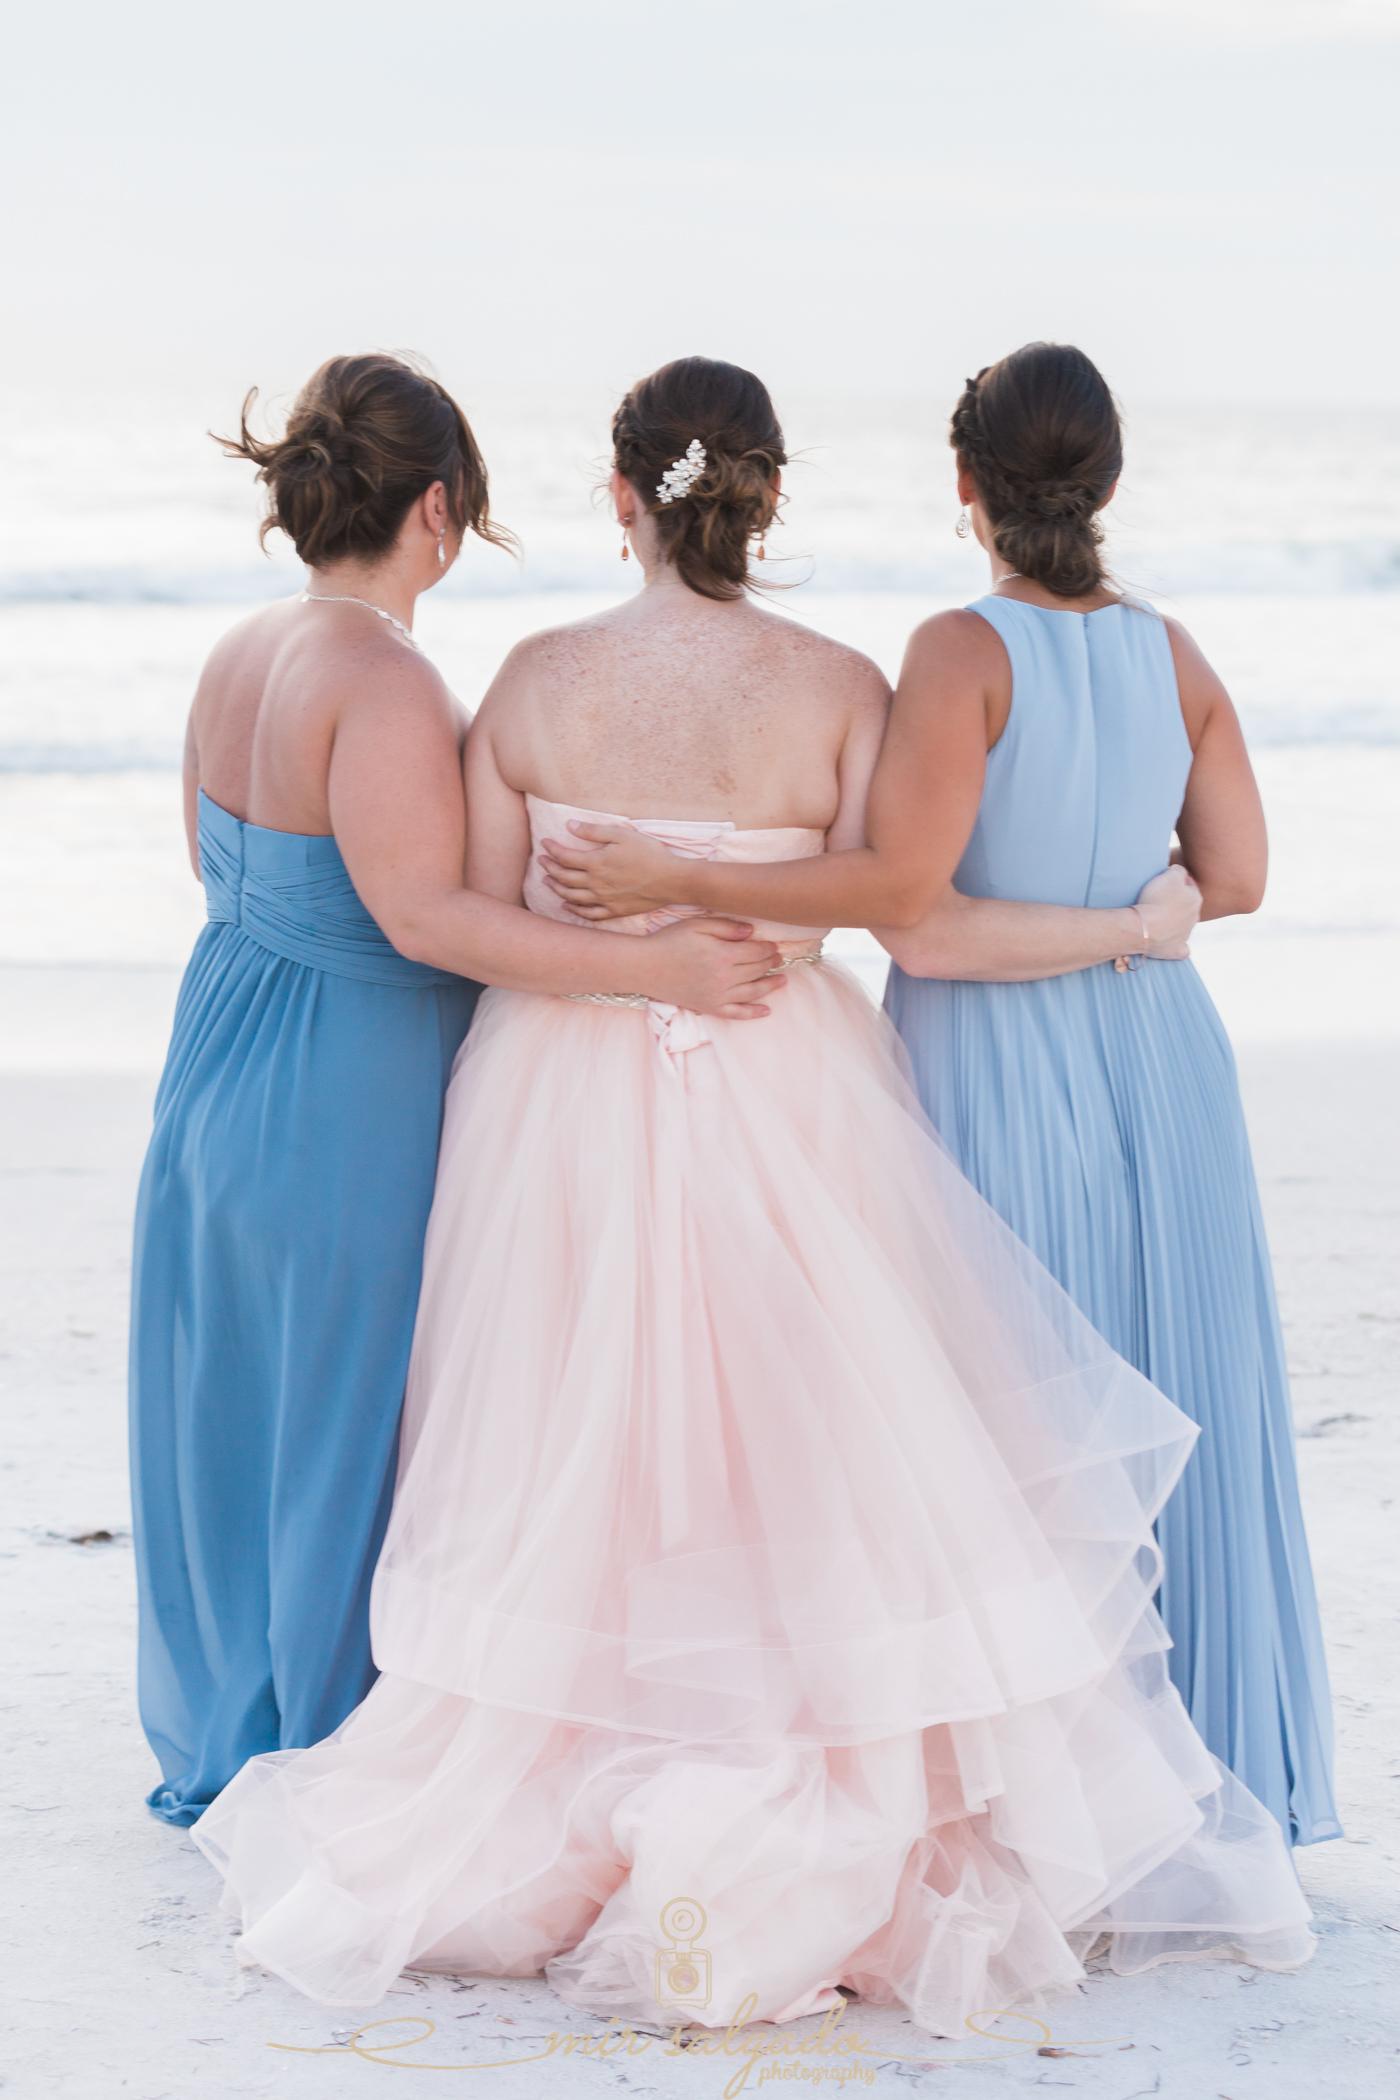 St.Pete-wedding, Bridesmaids-wedding-photo